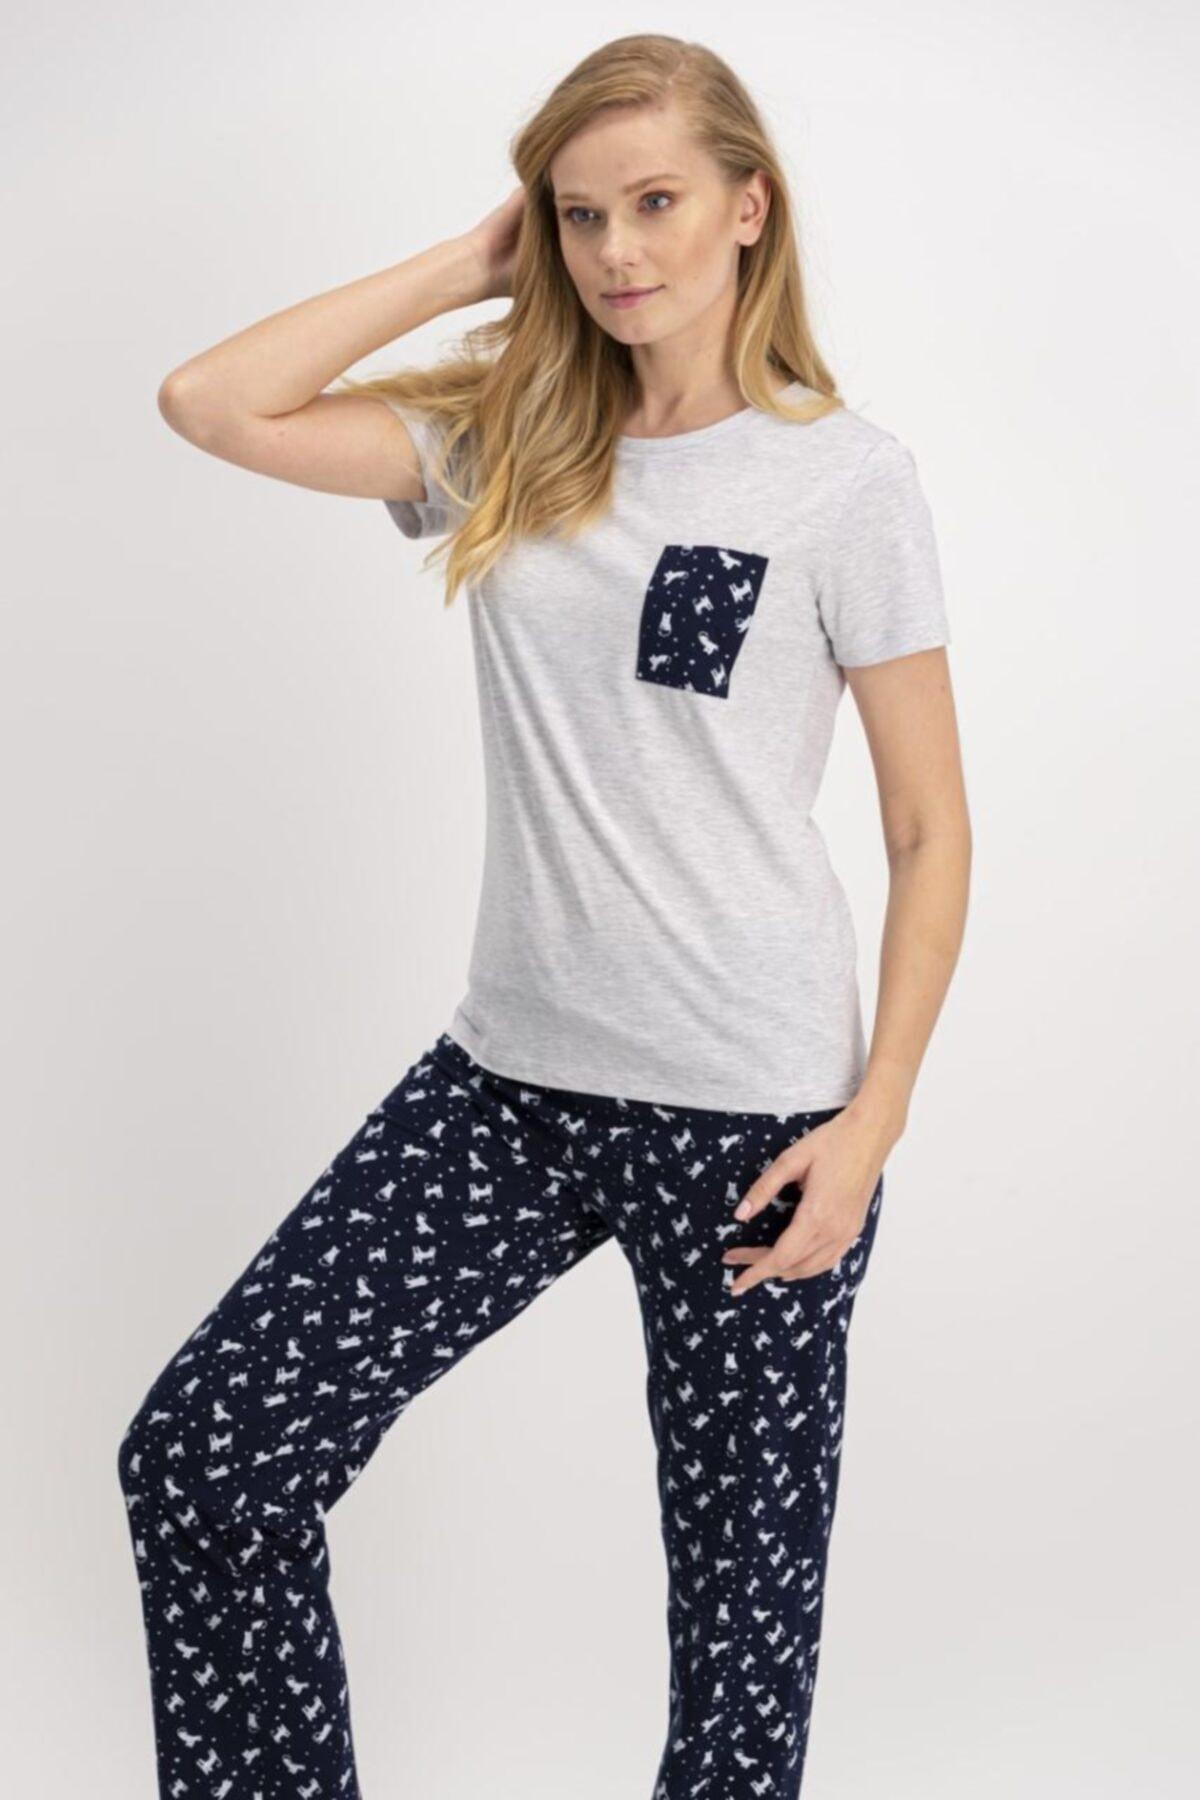 ROLY POLY Kadın Gri Kısa Kol Pijama Takımı Ar881 1